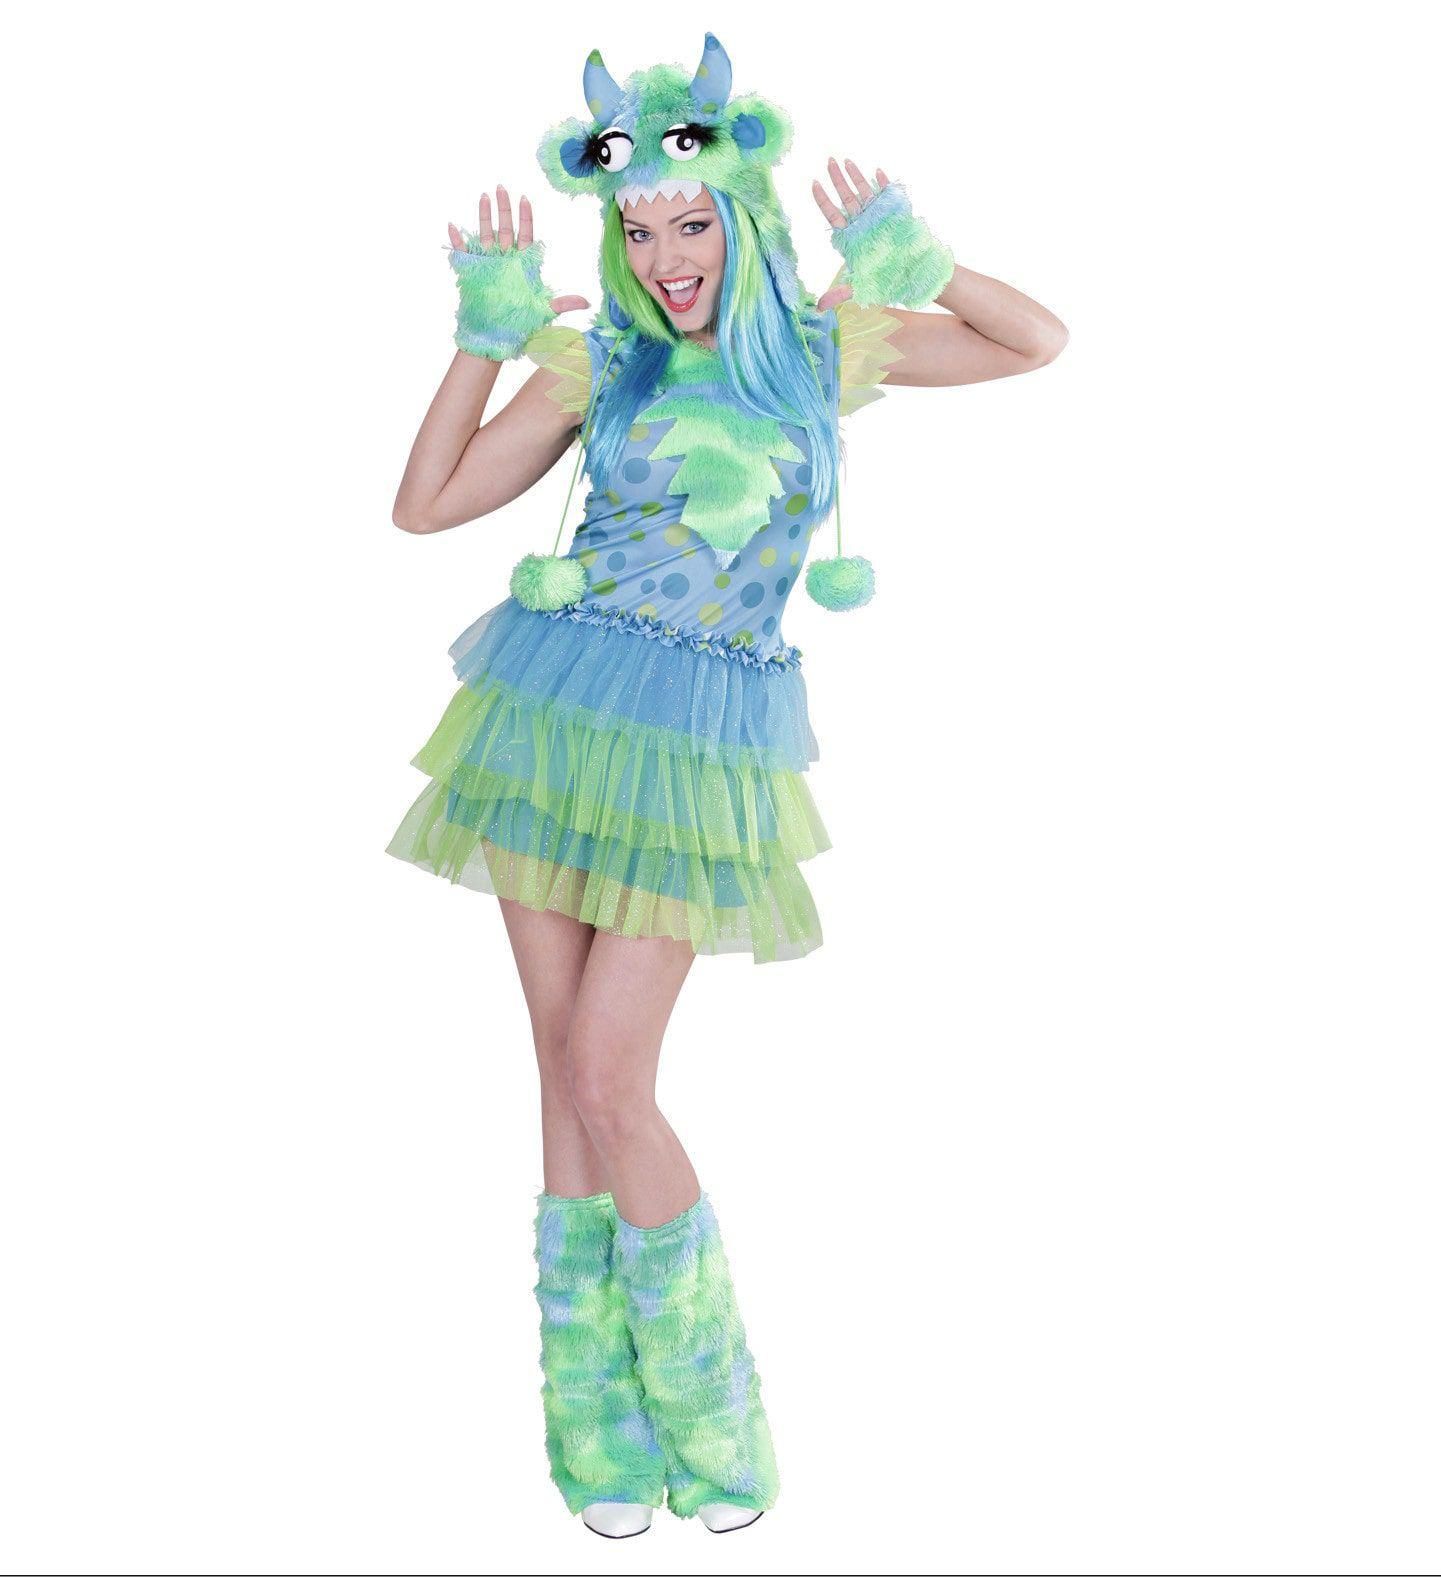 Groen Monster Meisje Ms Comic Strip Vrouw Kostuum